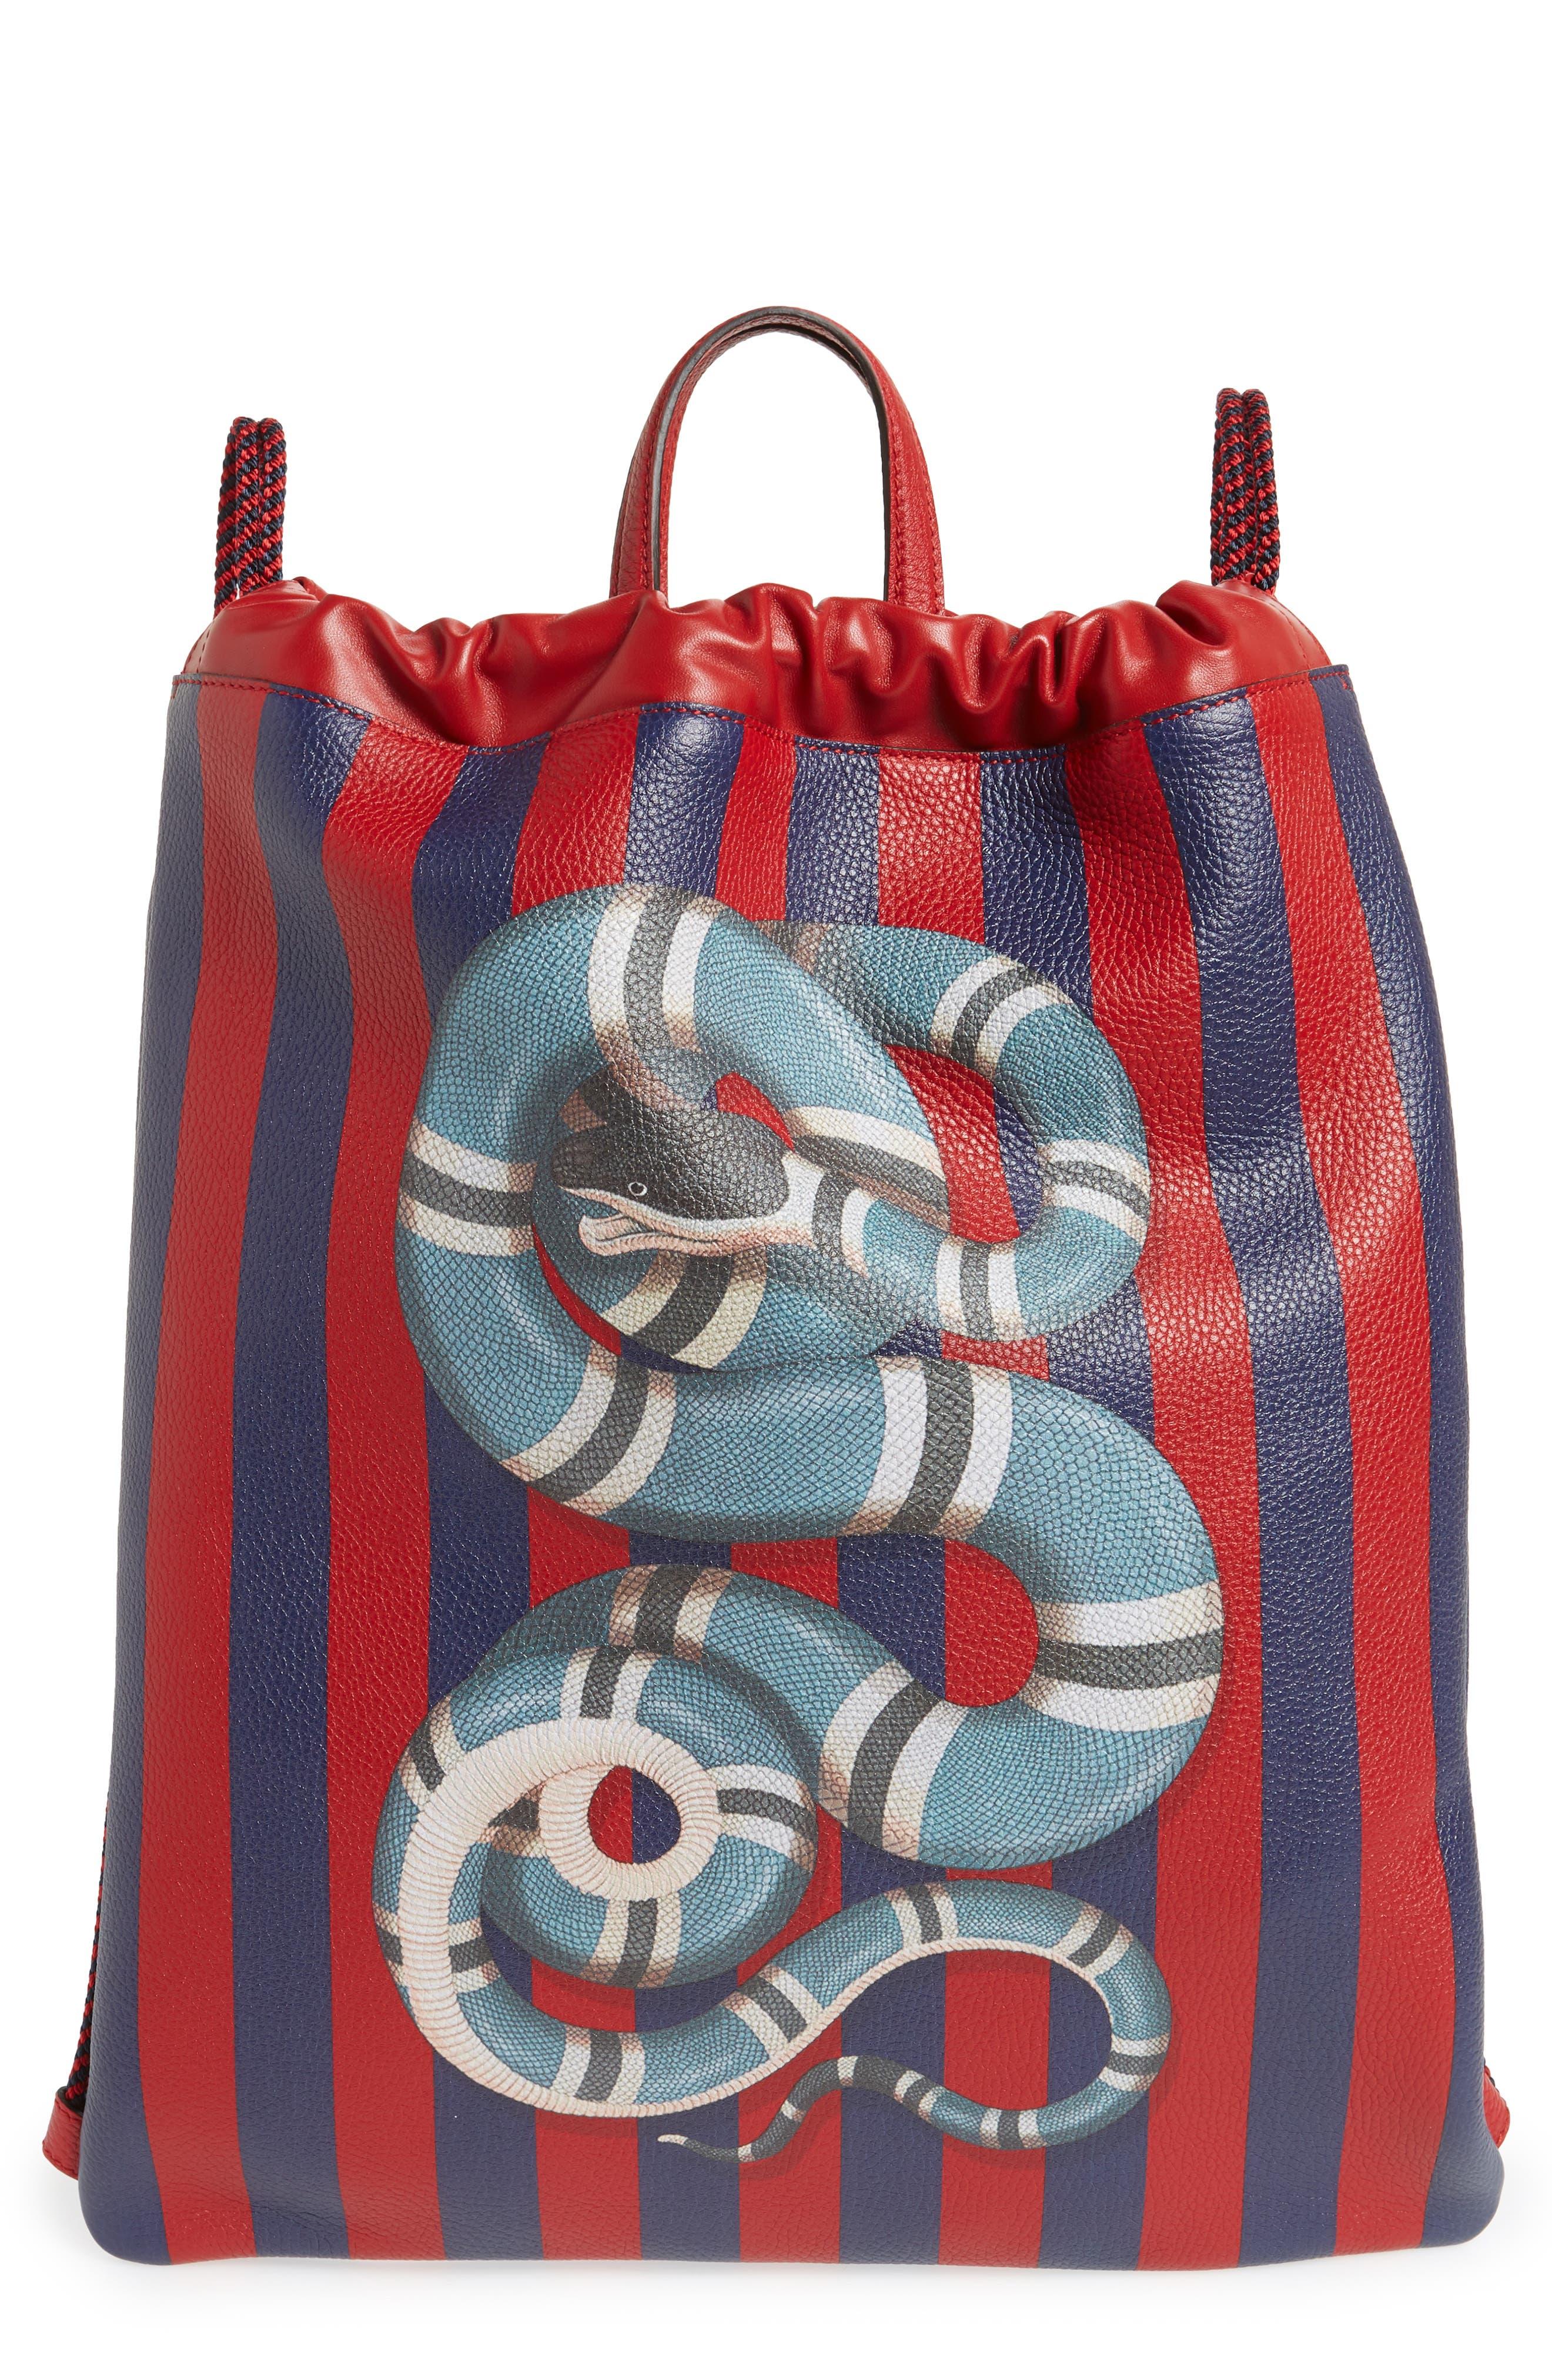 Kingsnake Stripe Leather Drawstring Backpack,                             Main thumbnail 1, color,                             RED